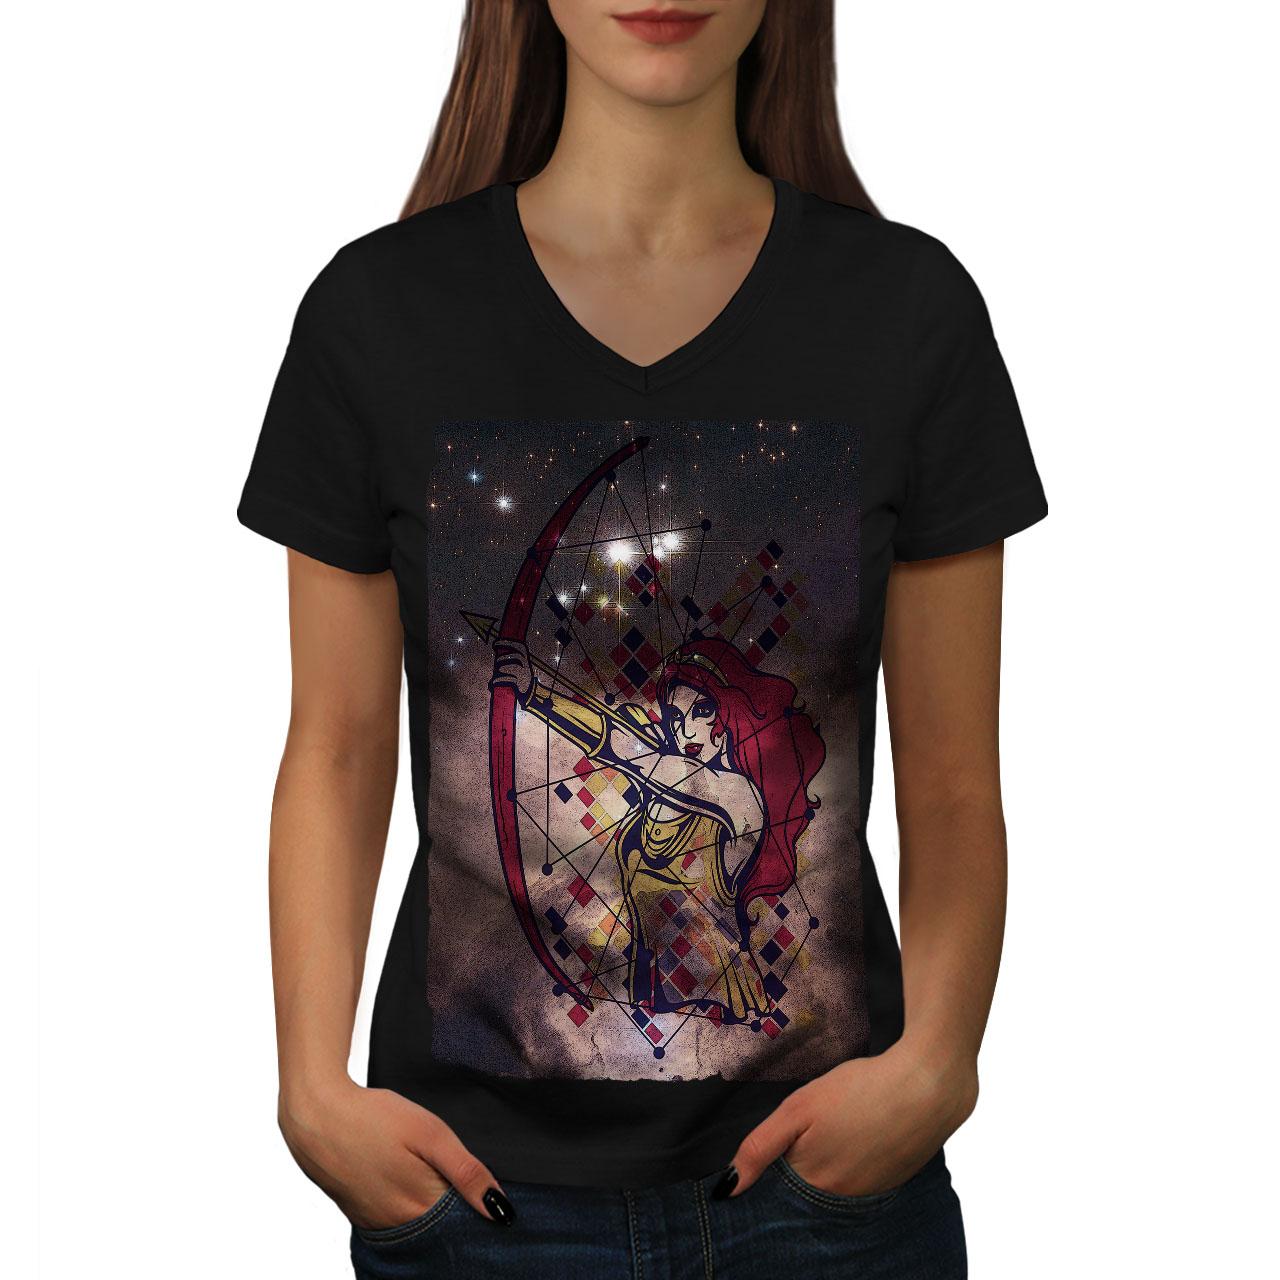 Wellcoda Warning Fairies Fashion Mens T-shirt Graphic Design Printed Tee